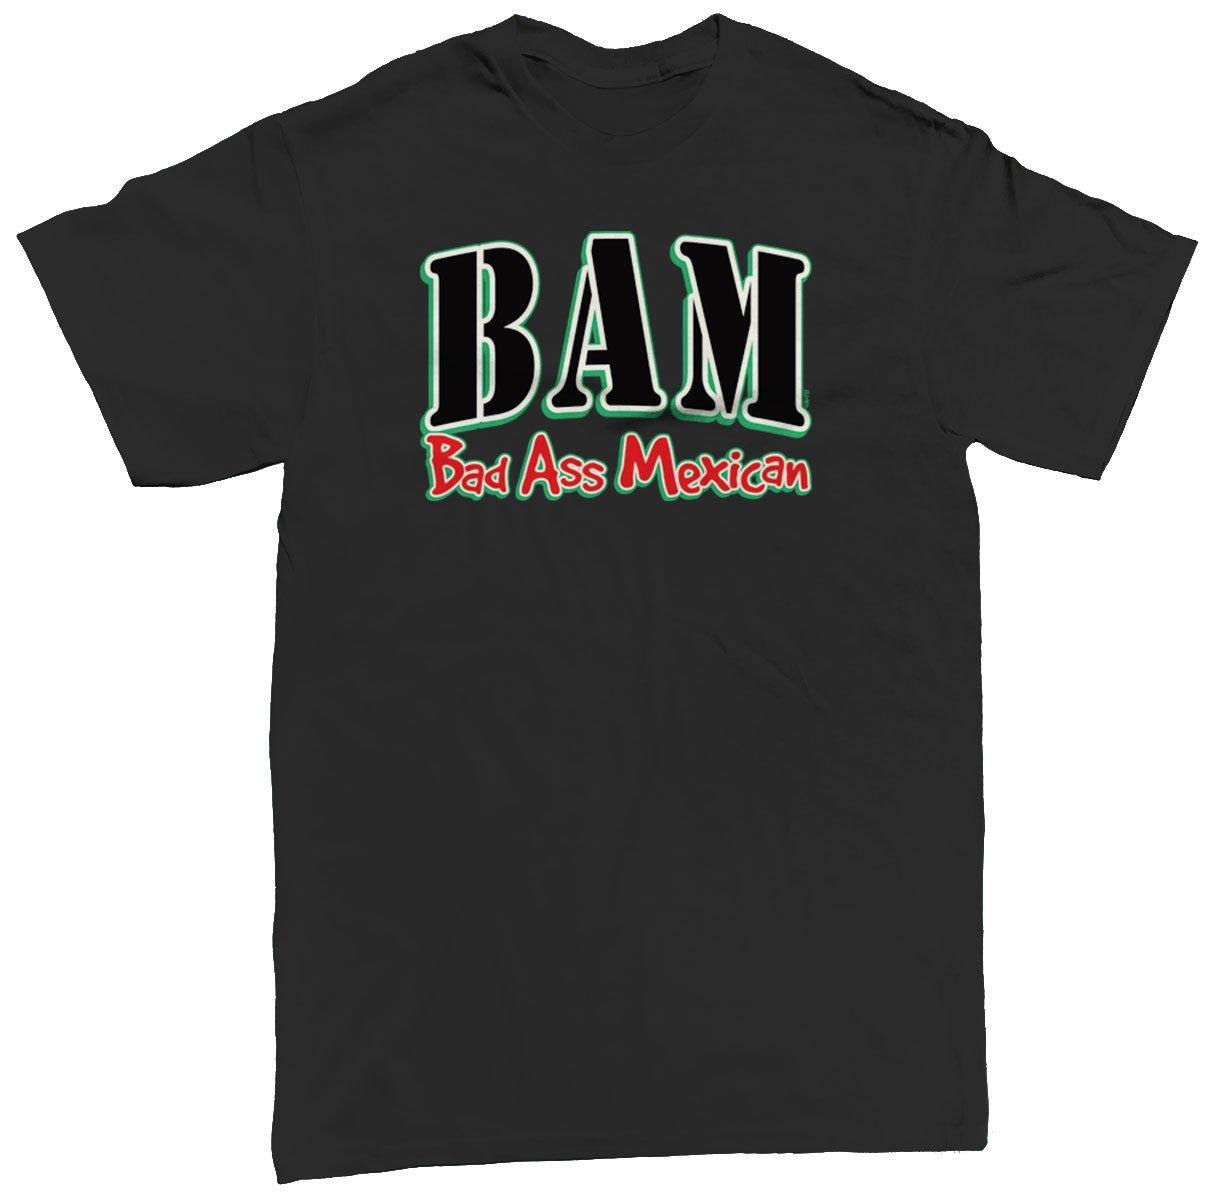 Bad Ass Mexican S T Shirt Apparel